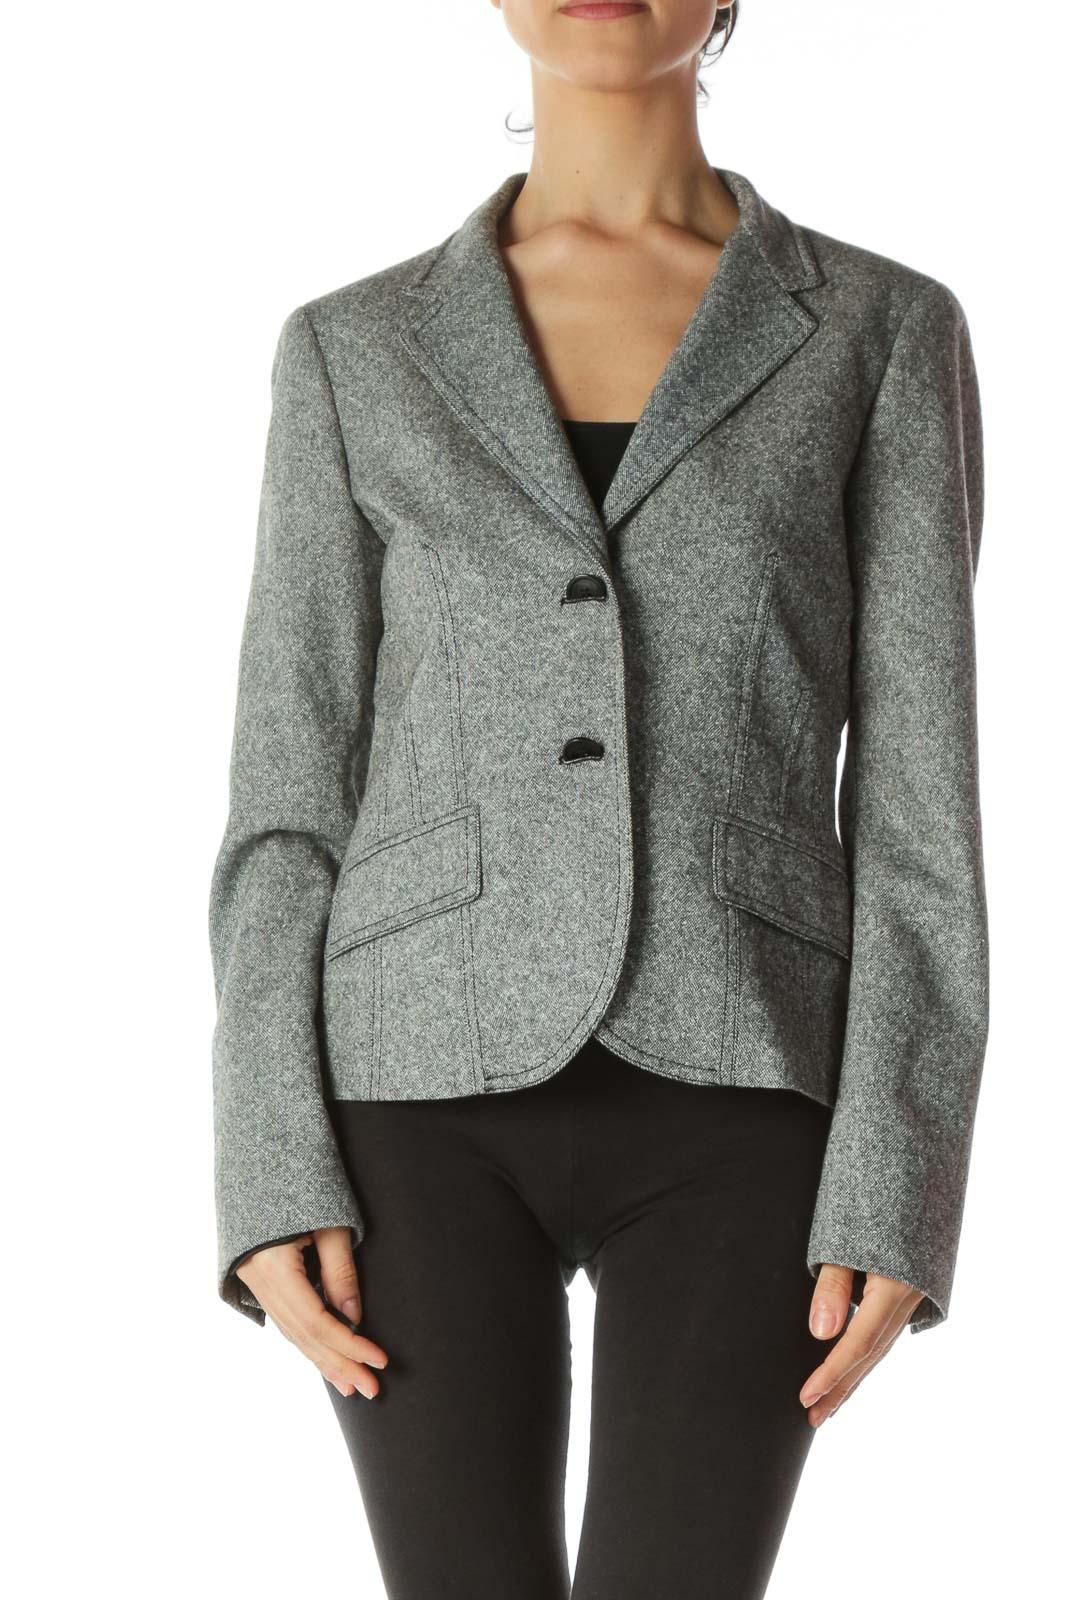 Black White Birdseye Knit Buttoned Blazer